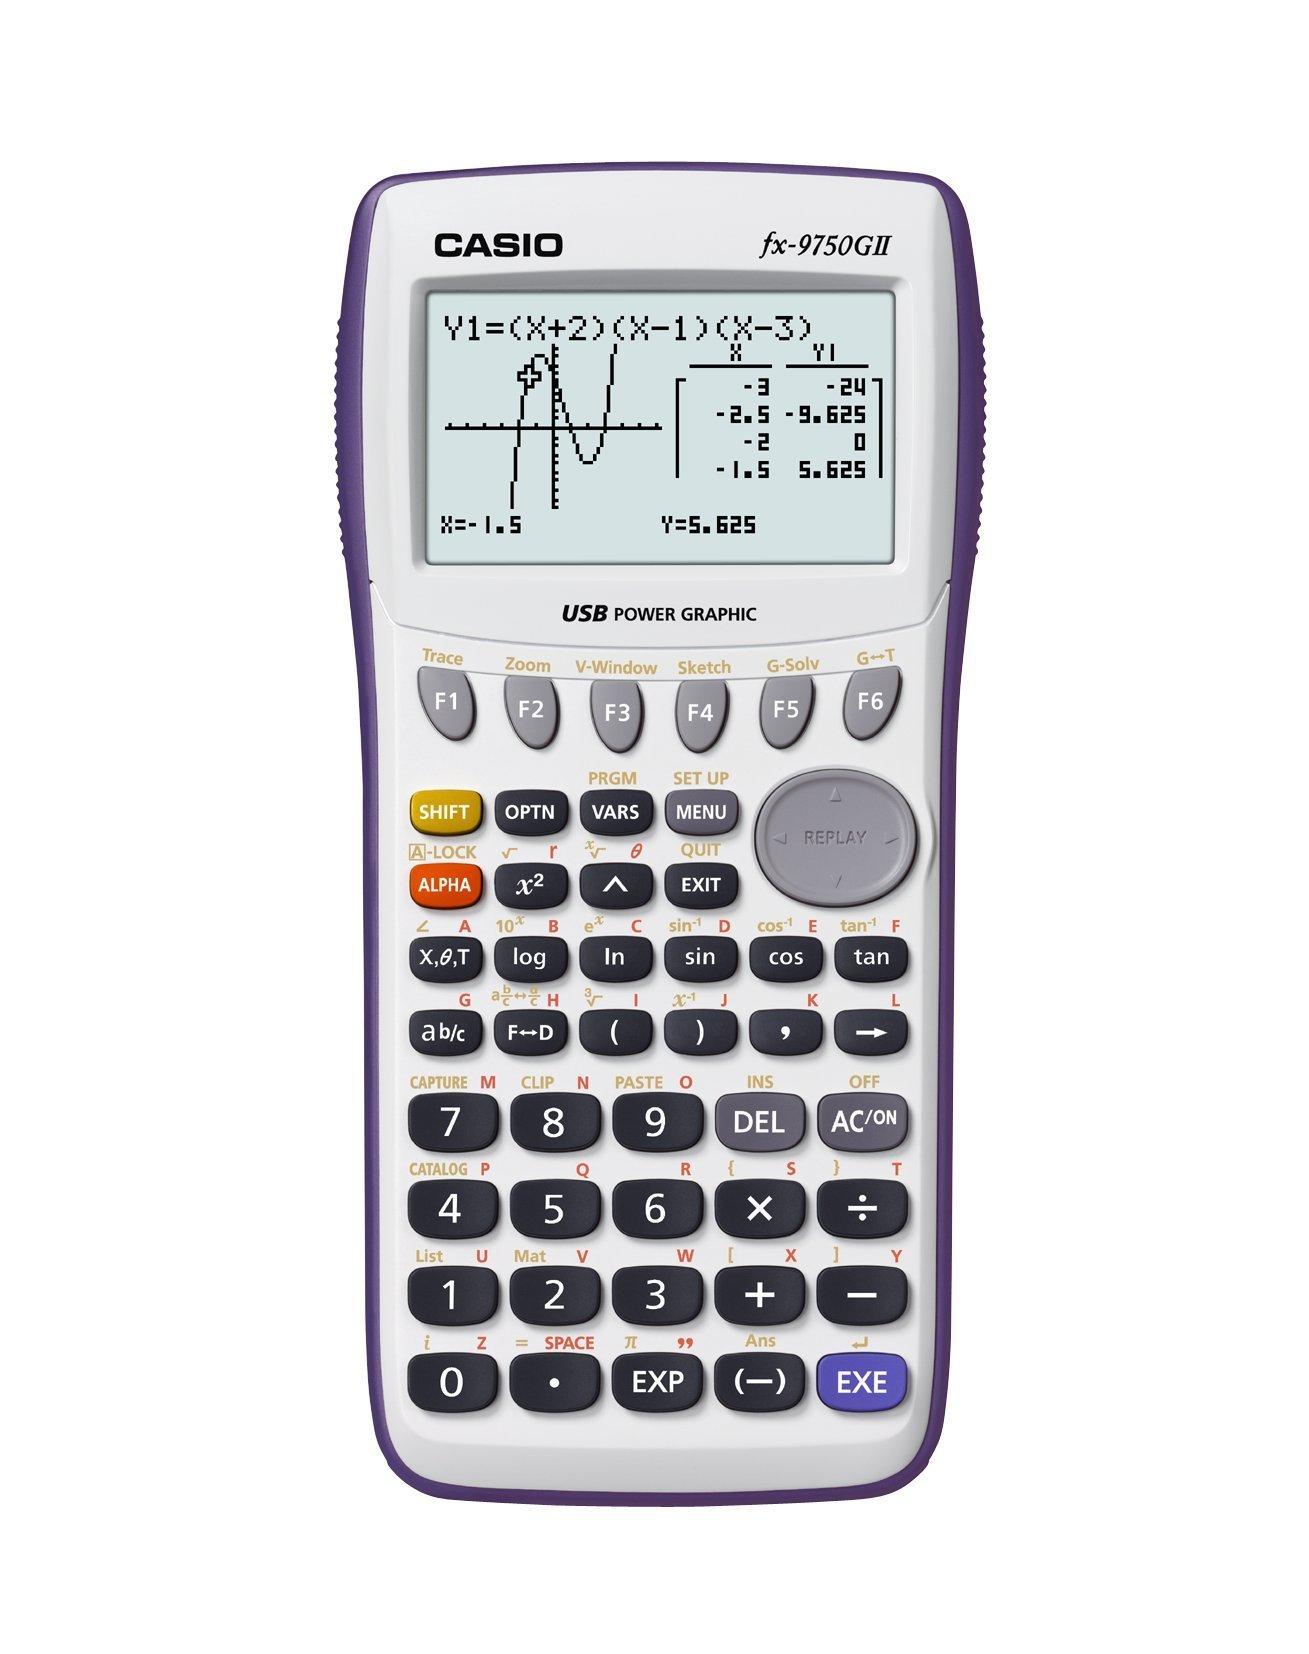 Casio fx-9750GII Graphing Calculator, White (Renewed) by Casio